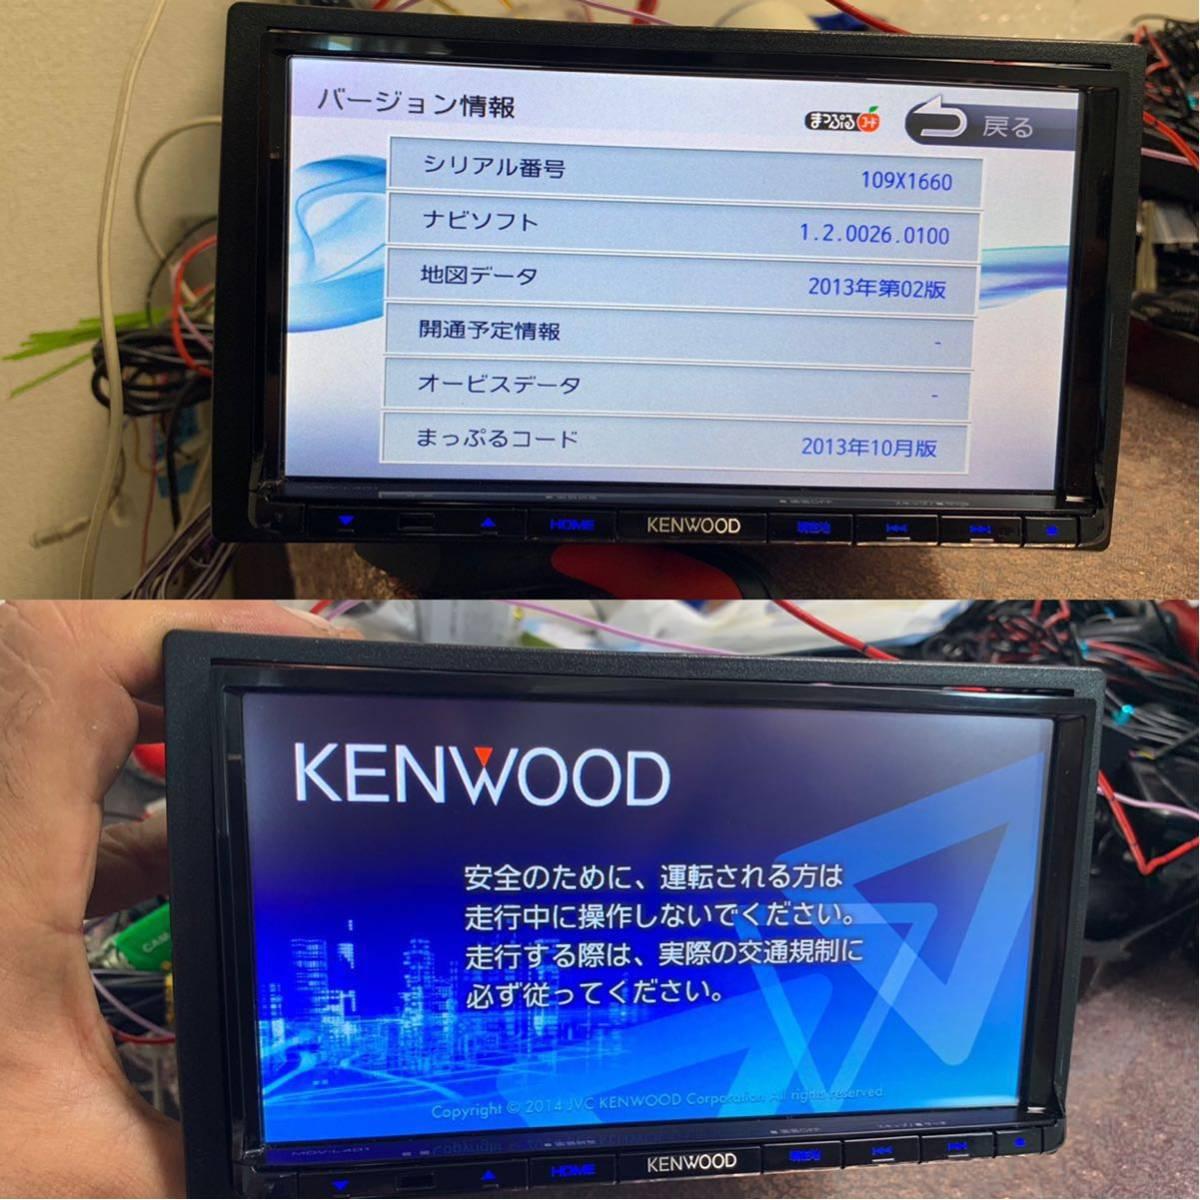 KENWOOD ケンウッド 2014年製. MDV-L401 メモリーカーナビ/ワンセグ/DVD/SD 地区データは2013 _画像4